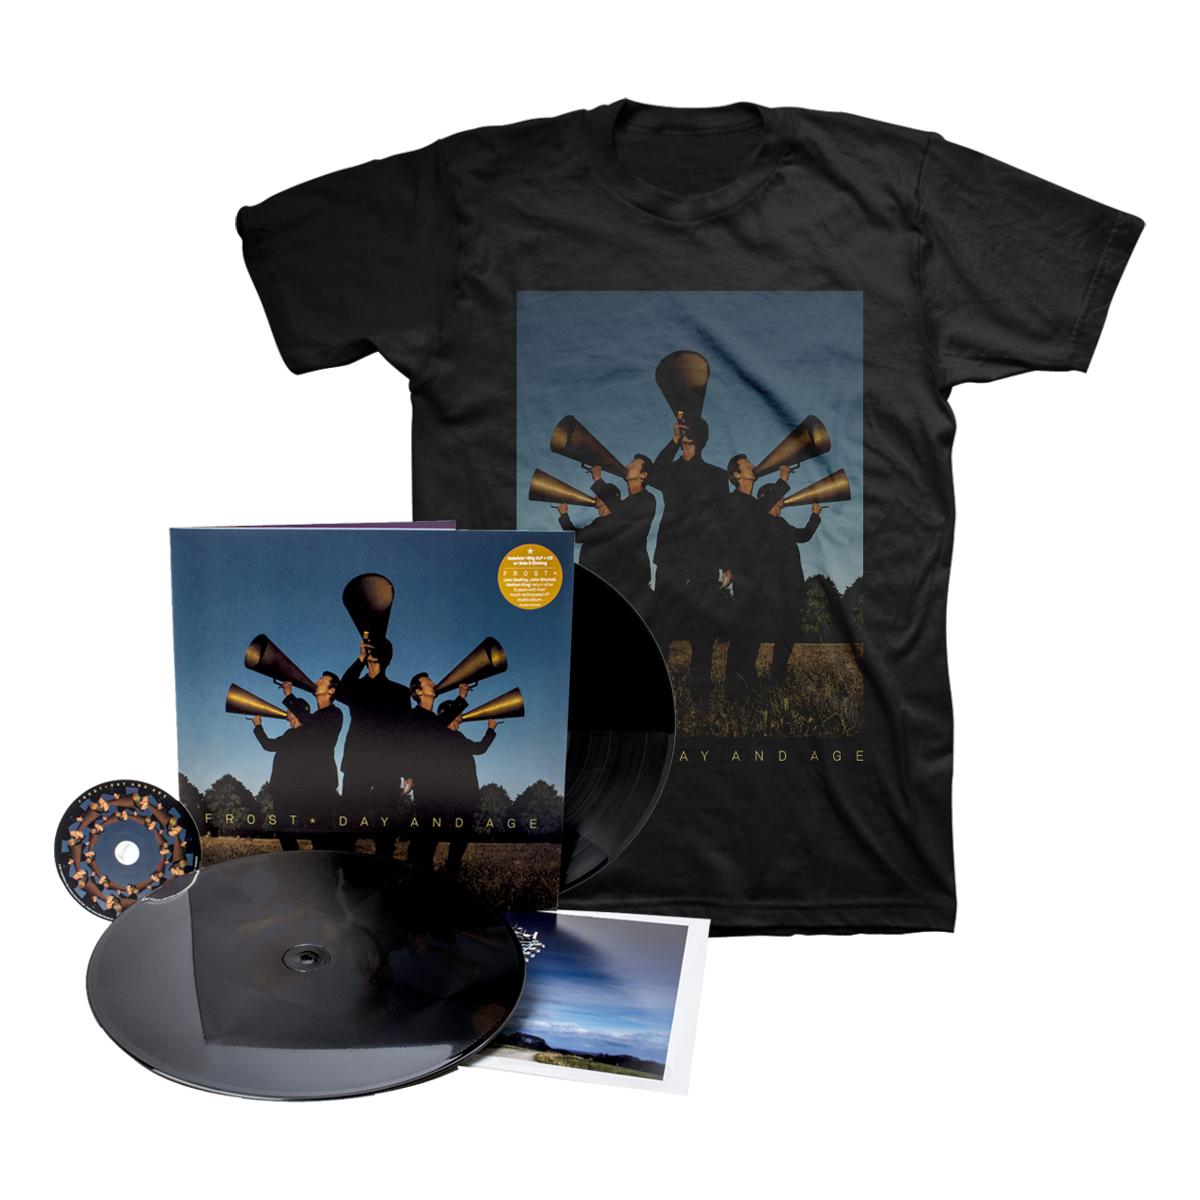 Frost* - Day And Age Black Vinyl 2LP + CD + Black T-Shirt + Digital Download